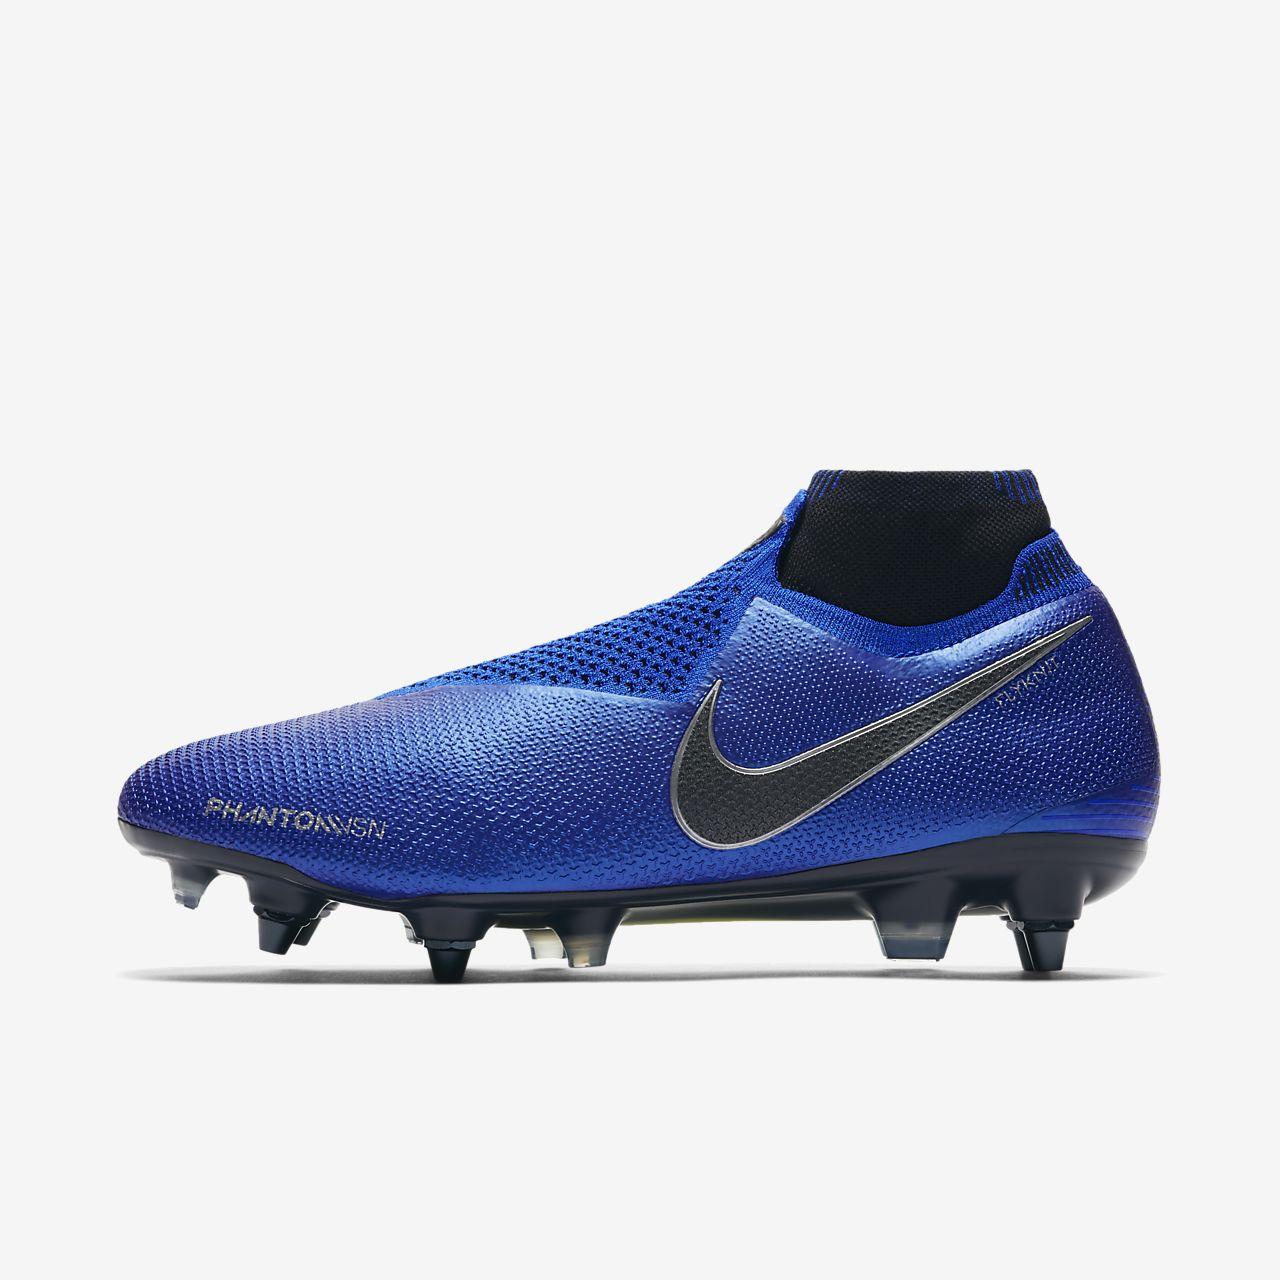 Crampons Phantom Dynamic Nike Elite Football De Vision À Chaussure fXzq6tFnw